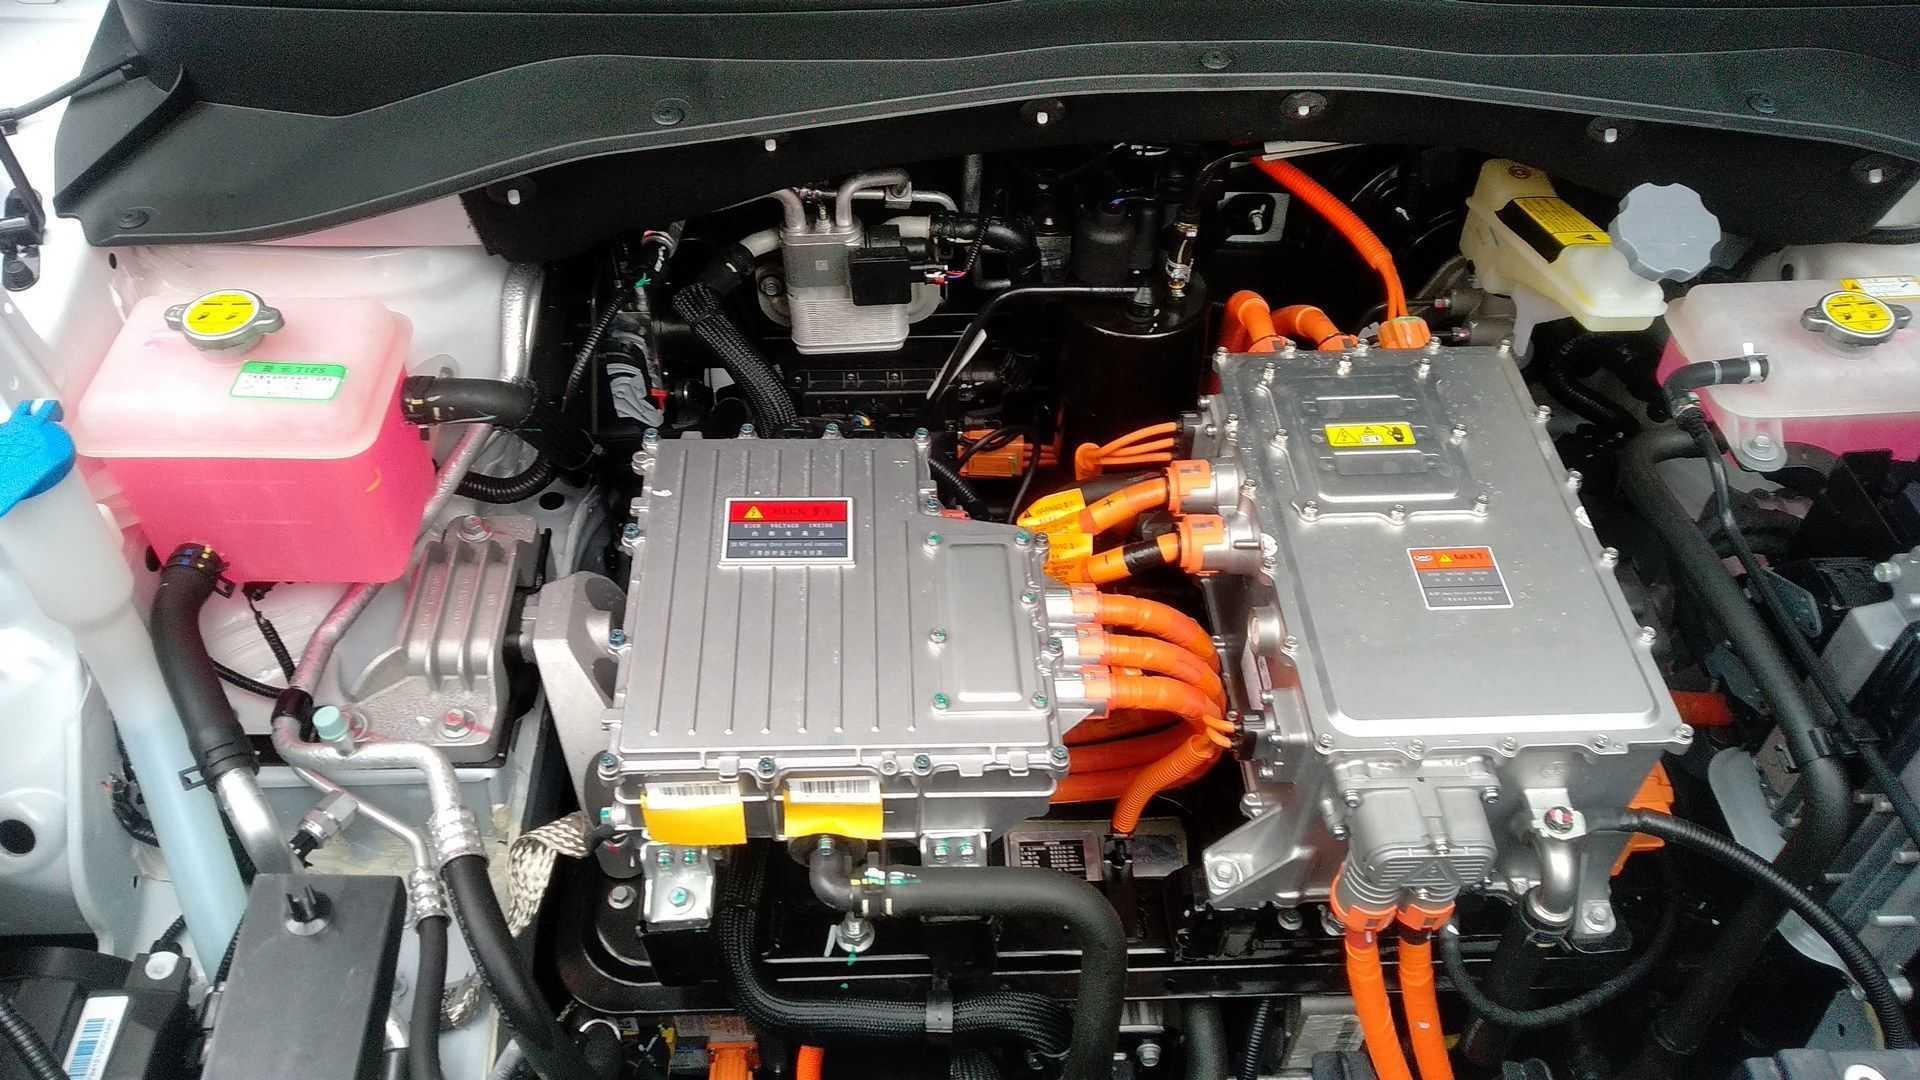 https://cdn.motor1.com/images/mgl/MNVvn/s6/jac-e-js4---test-drive-1-motor-eletrico.jpg